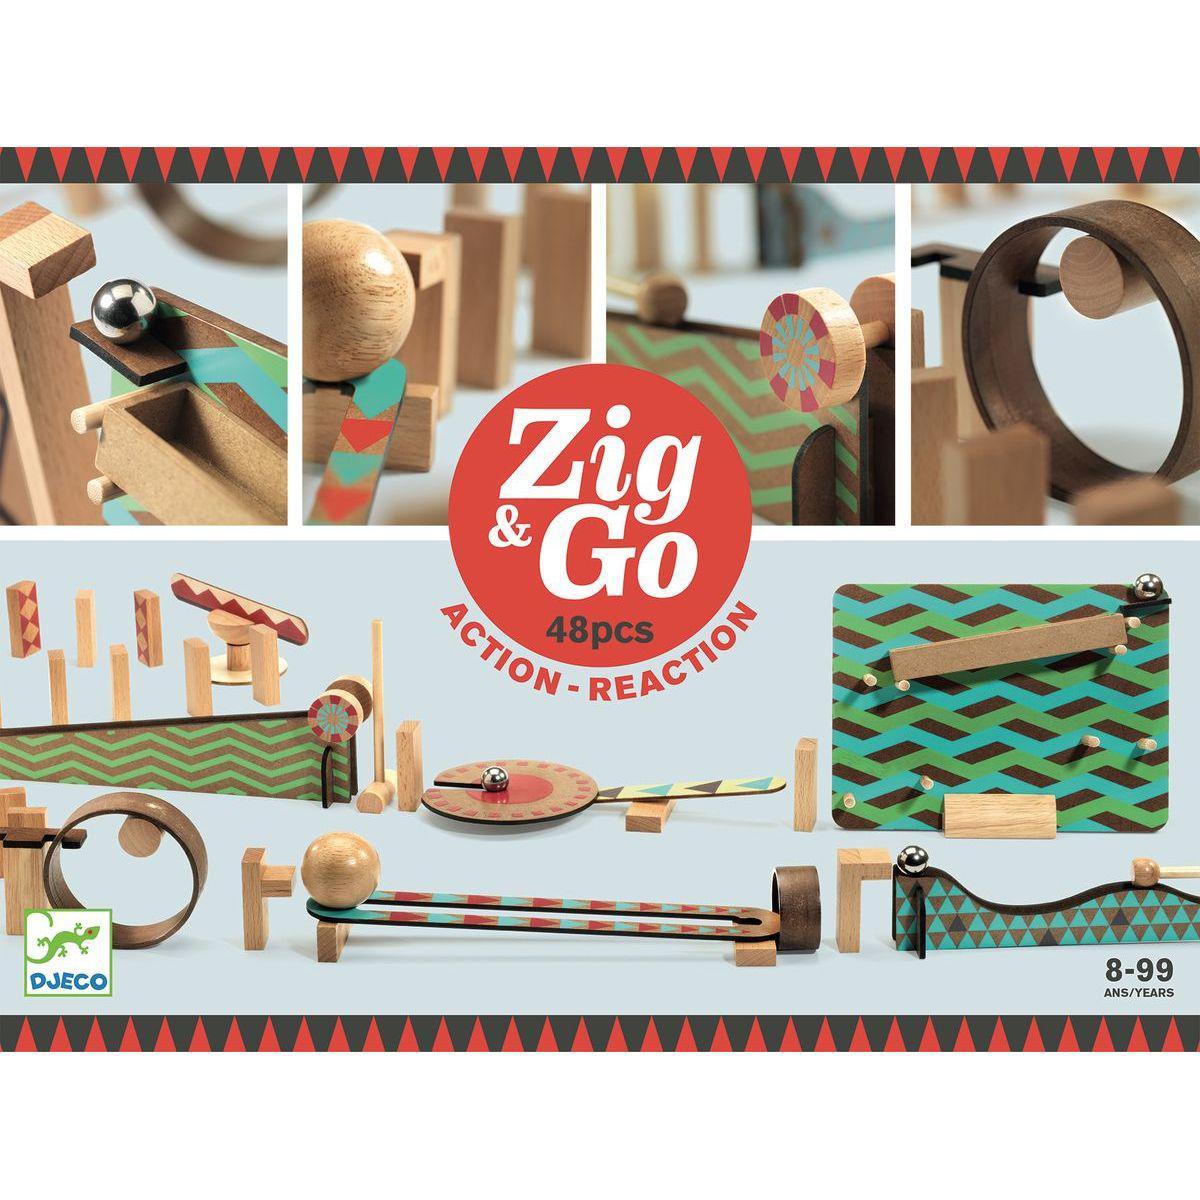 Parcours de domino 48pces ZIG & GO Djeco